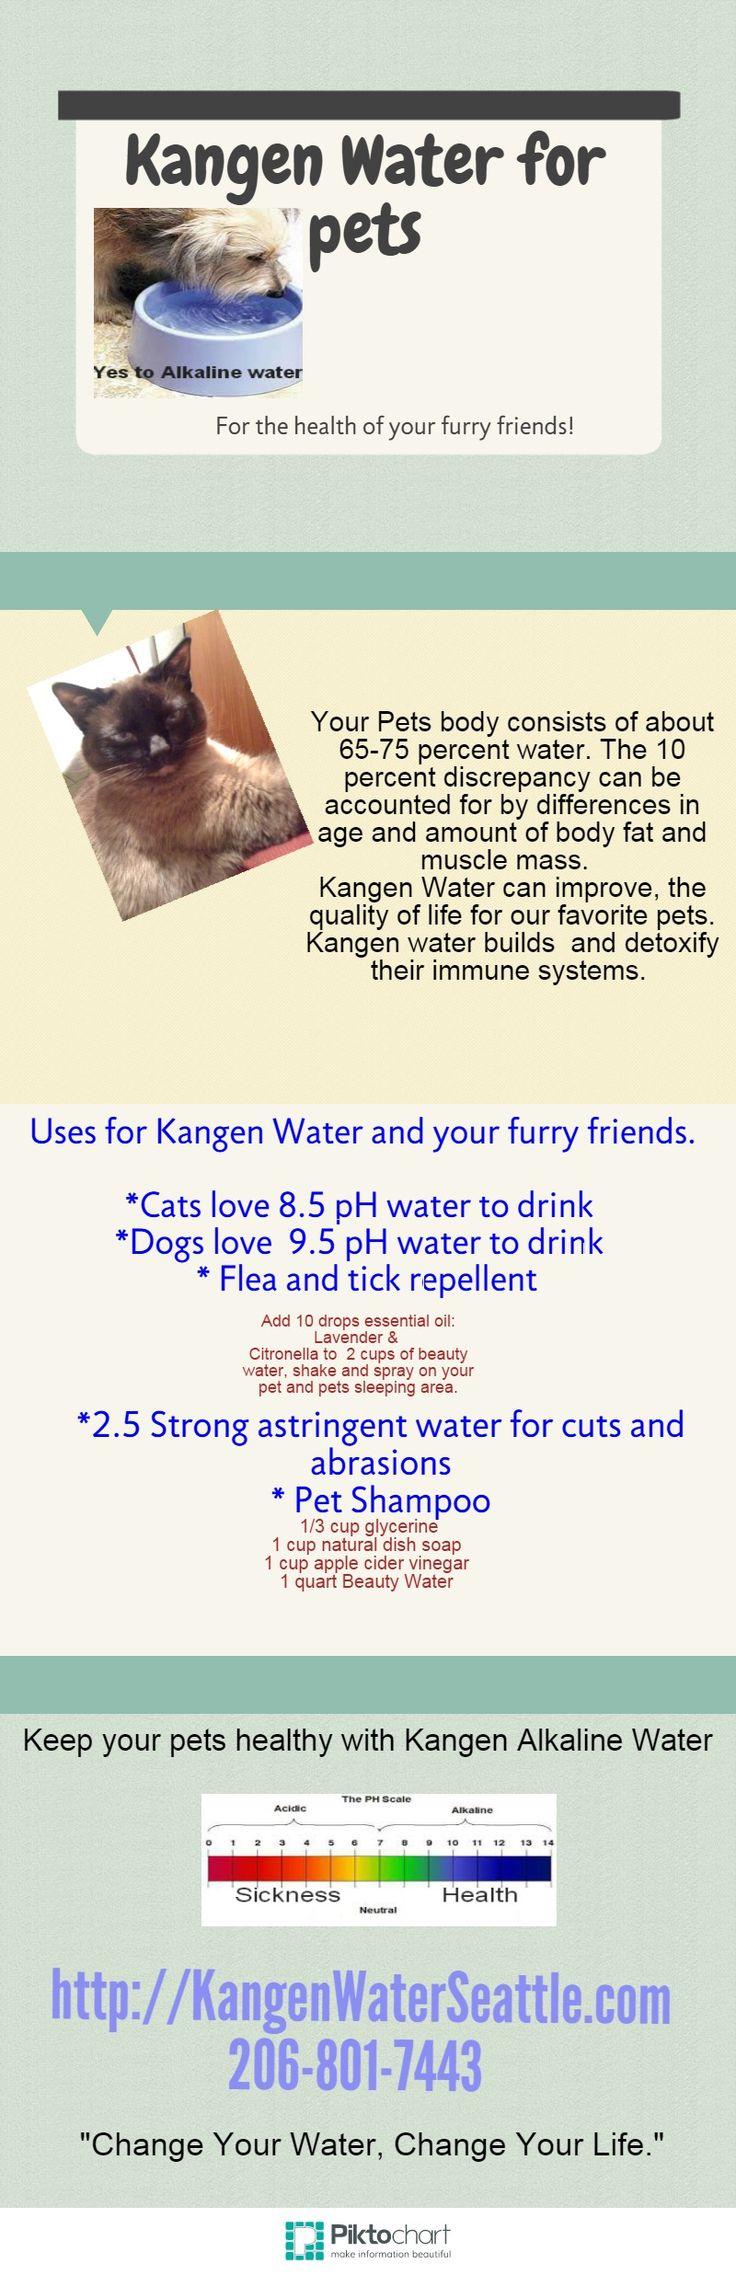 Kangen Water for pets Copy Copy | @Piktochart Infographic